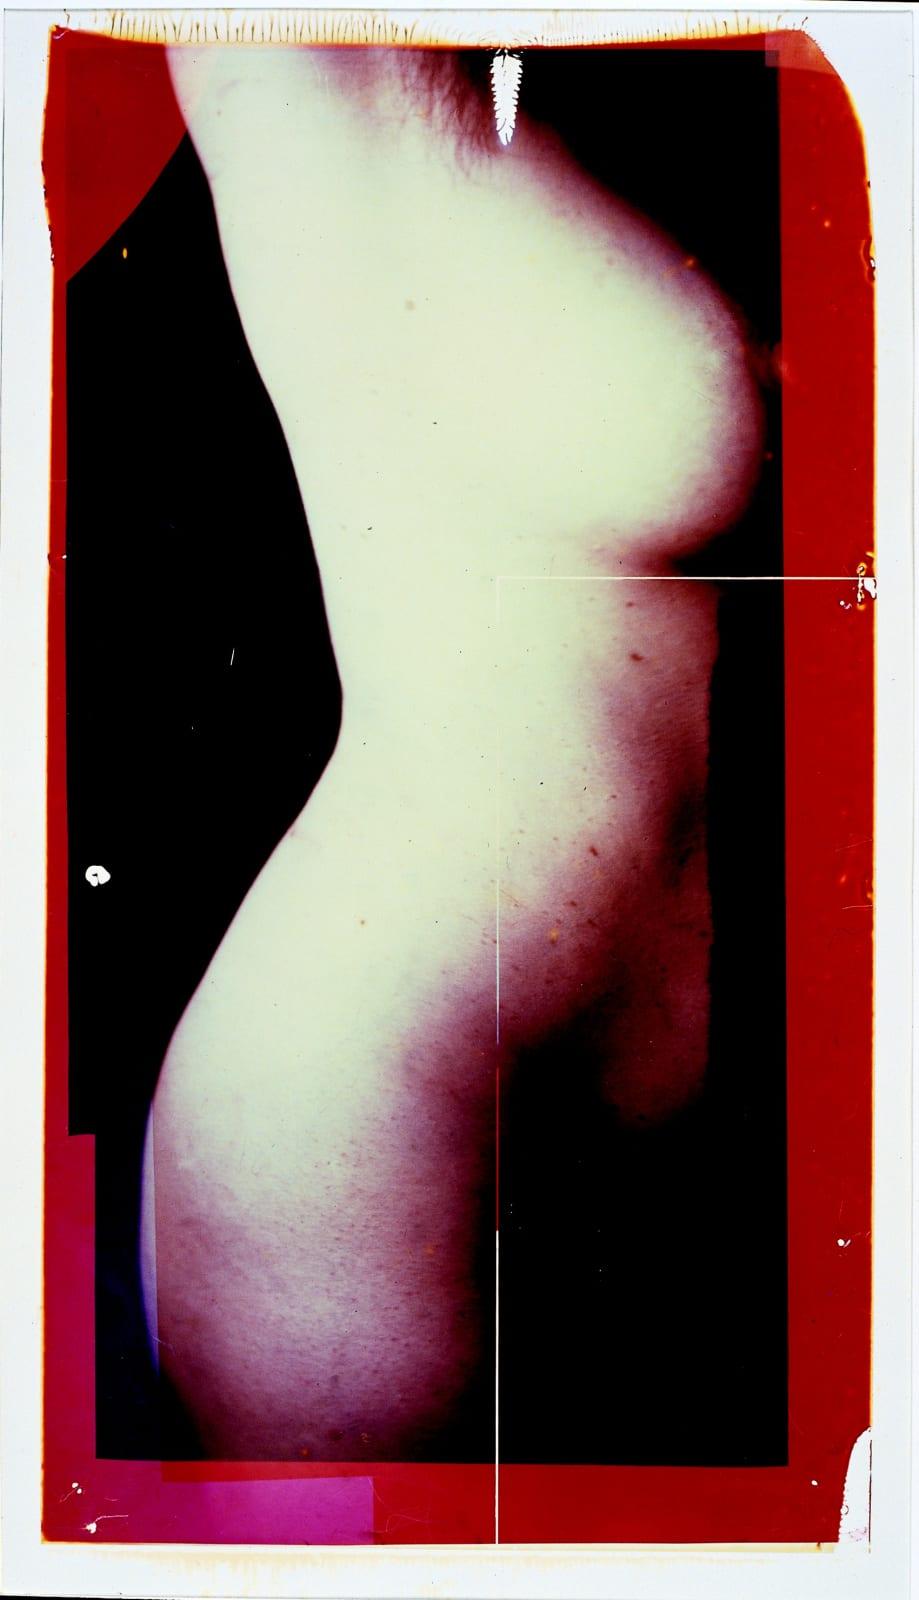 Paolo Gioli, Untitled, 1987